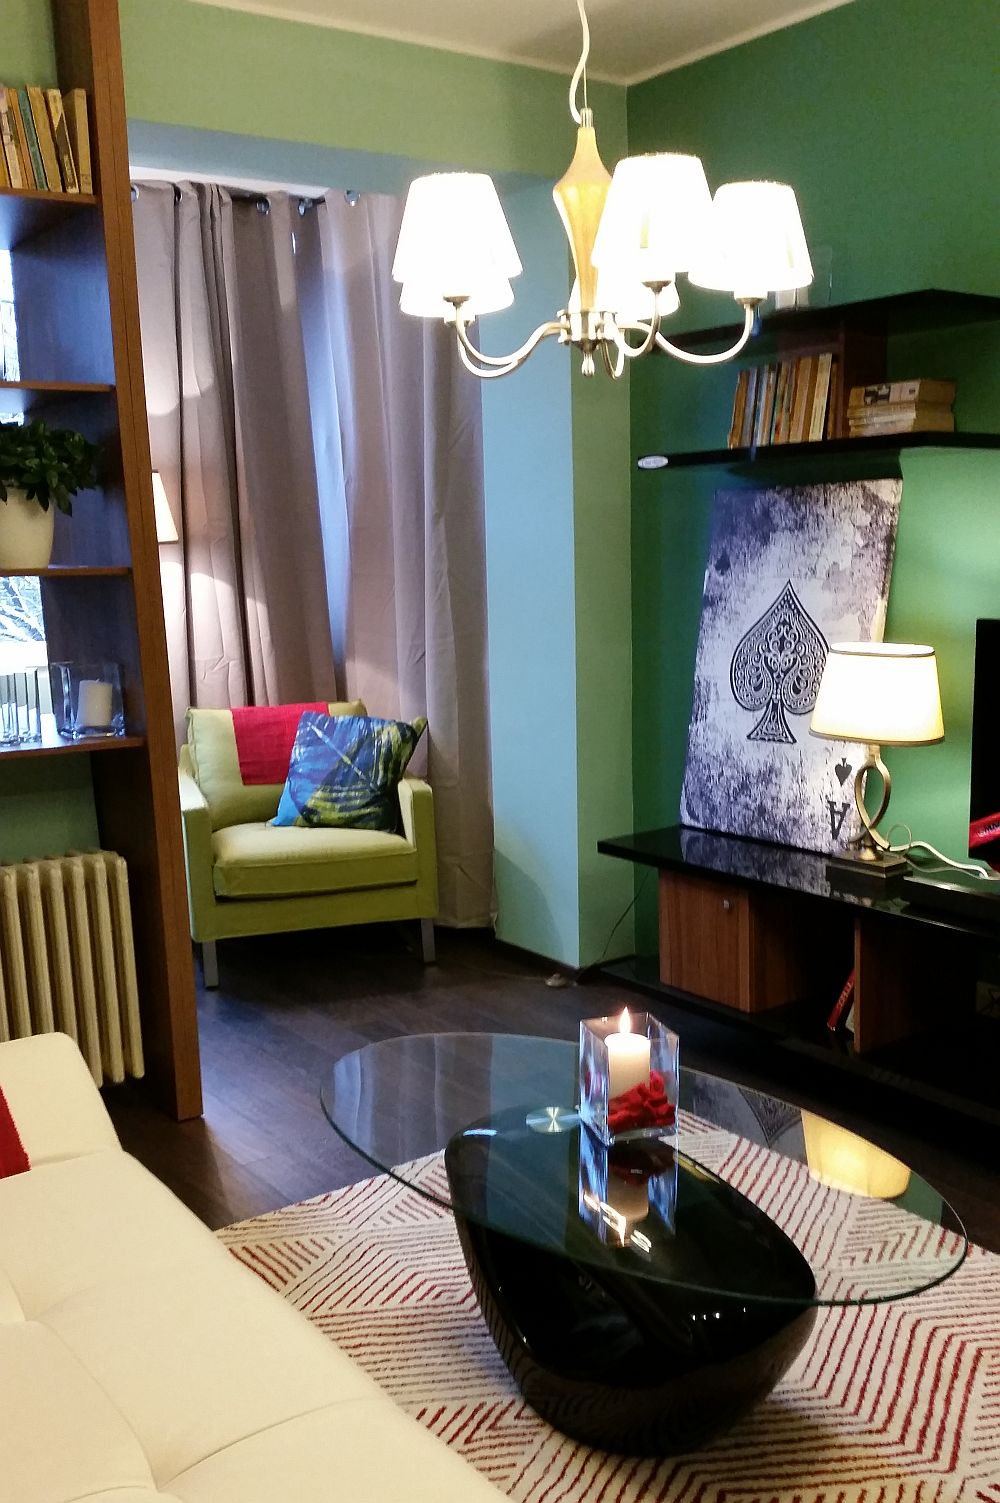 adelaparvu.com despre amenajare apartament Alice Muller din emisiunea Visuri la cheie de la ProTV, sezonul I, 2014 (19)